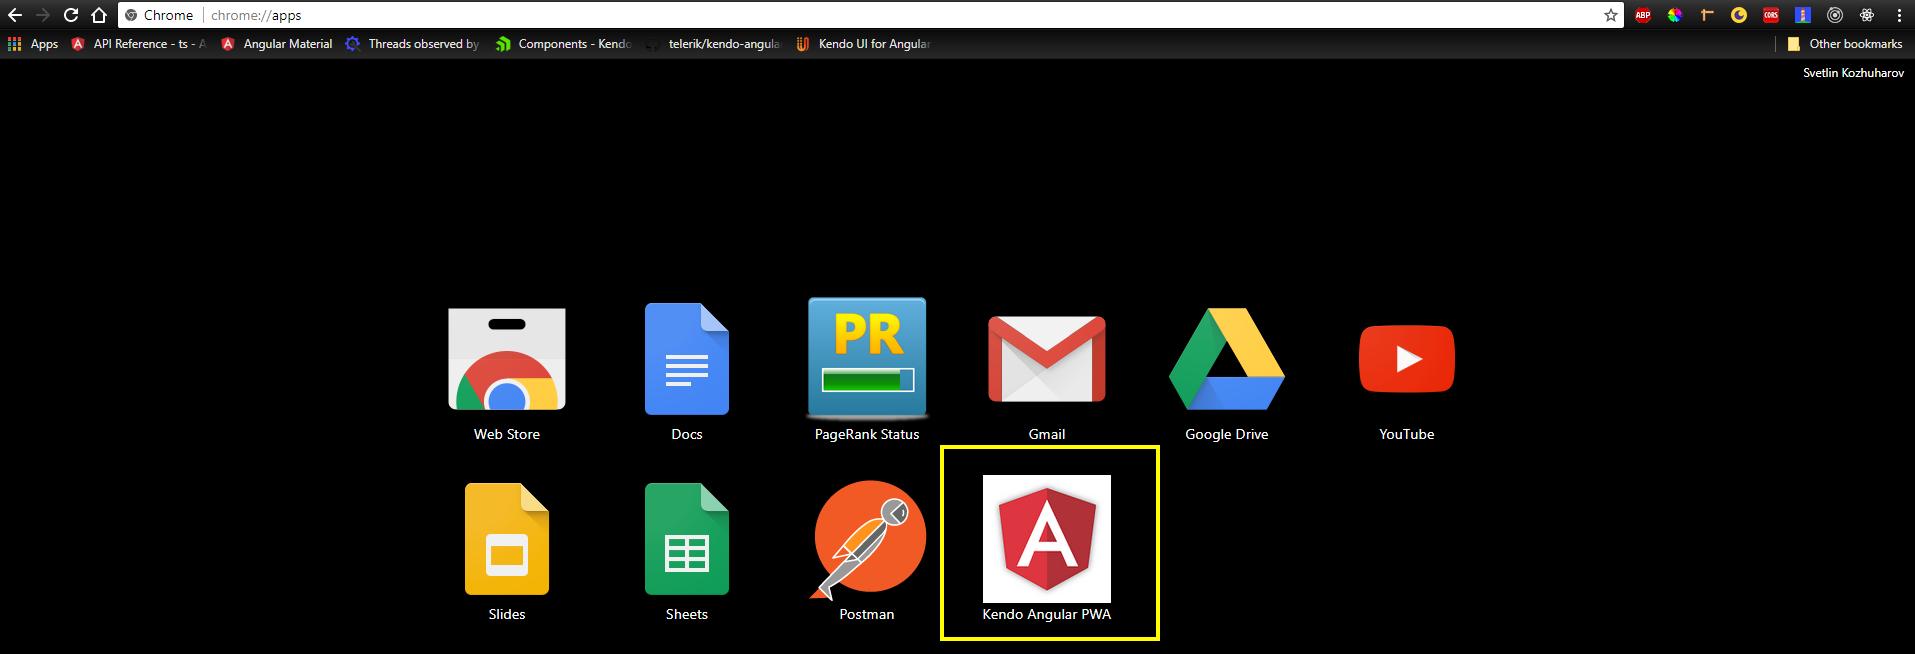 Browser dashboard